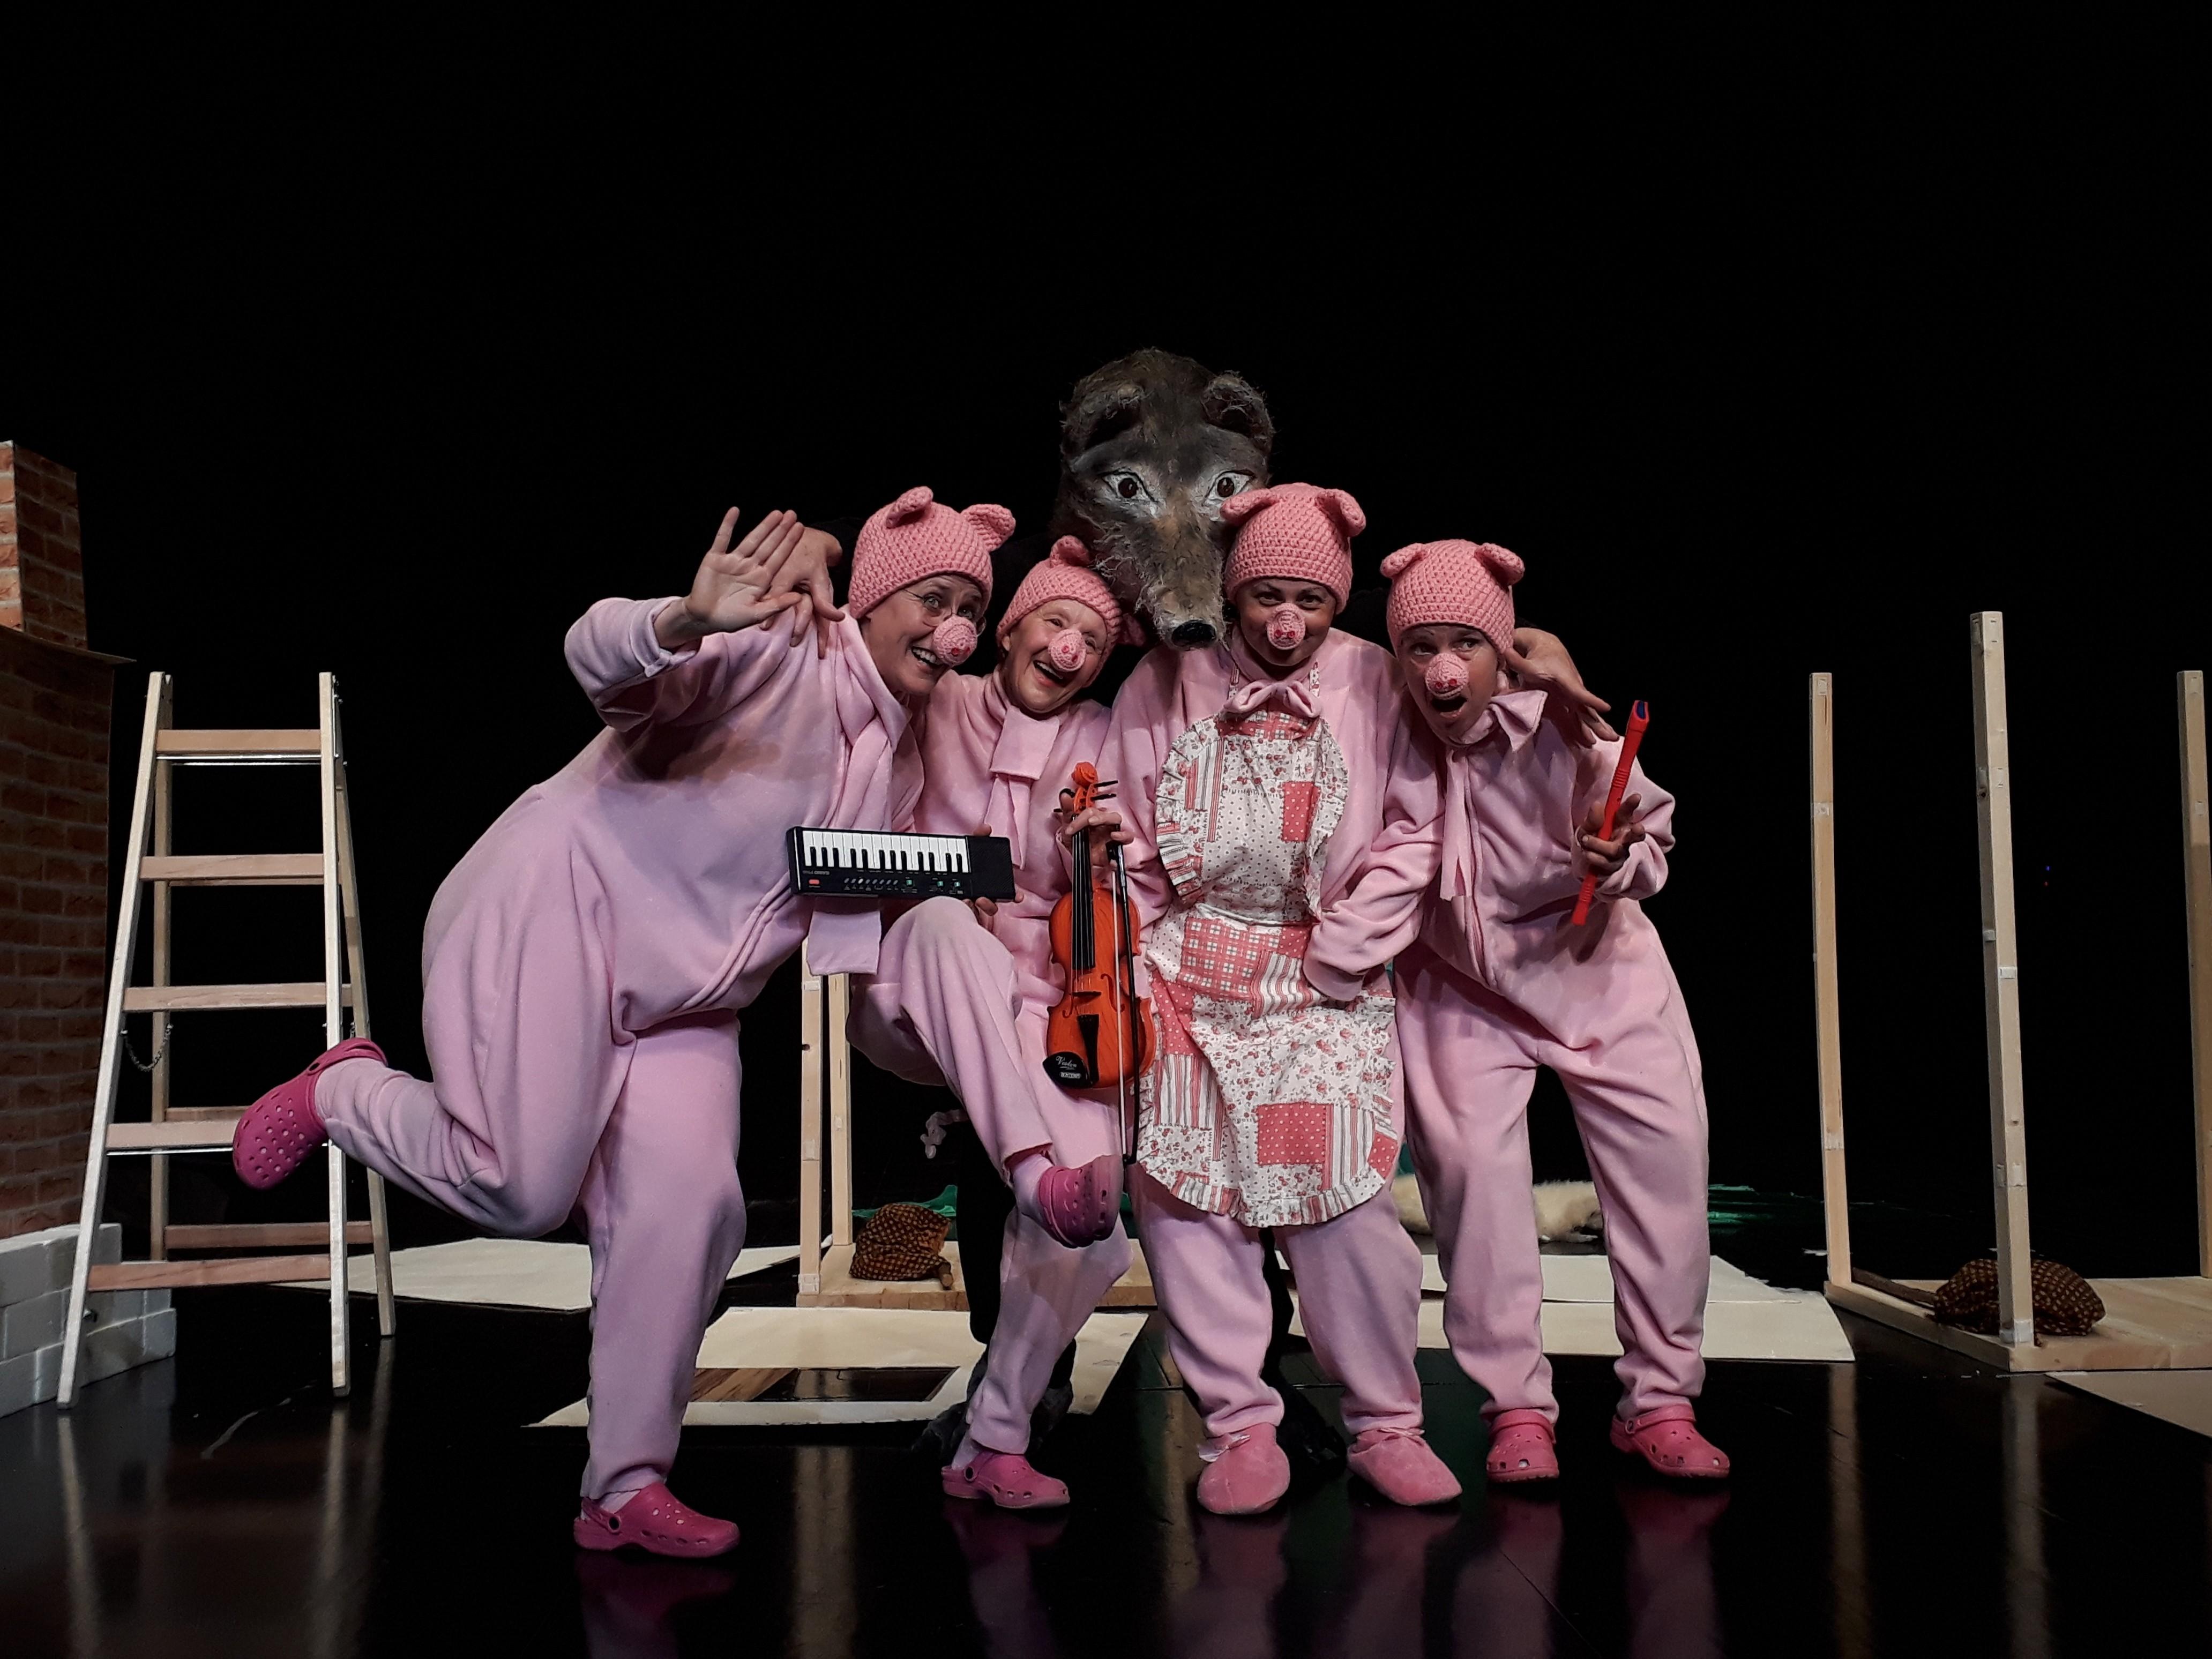 Gledališka skupina Vrtinec